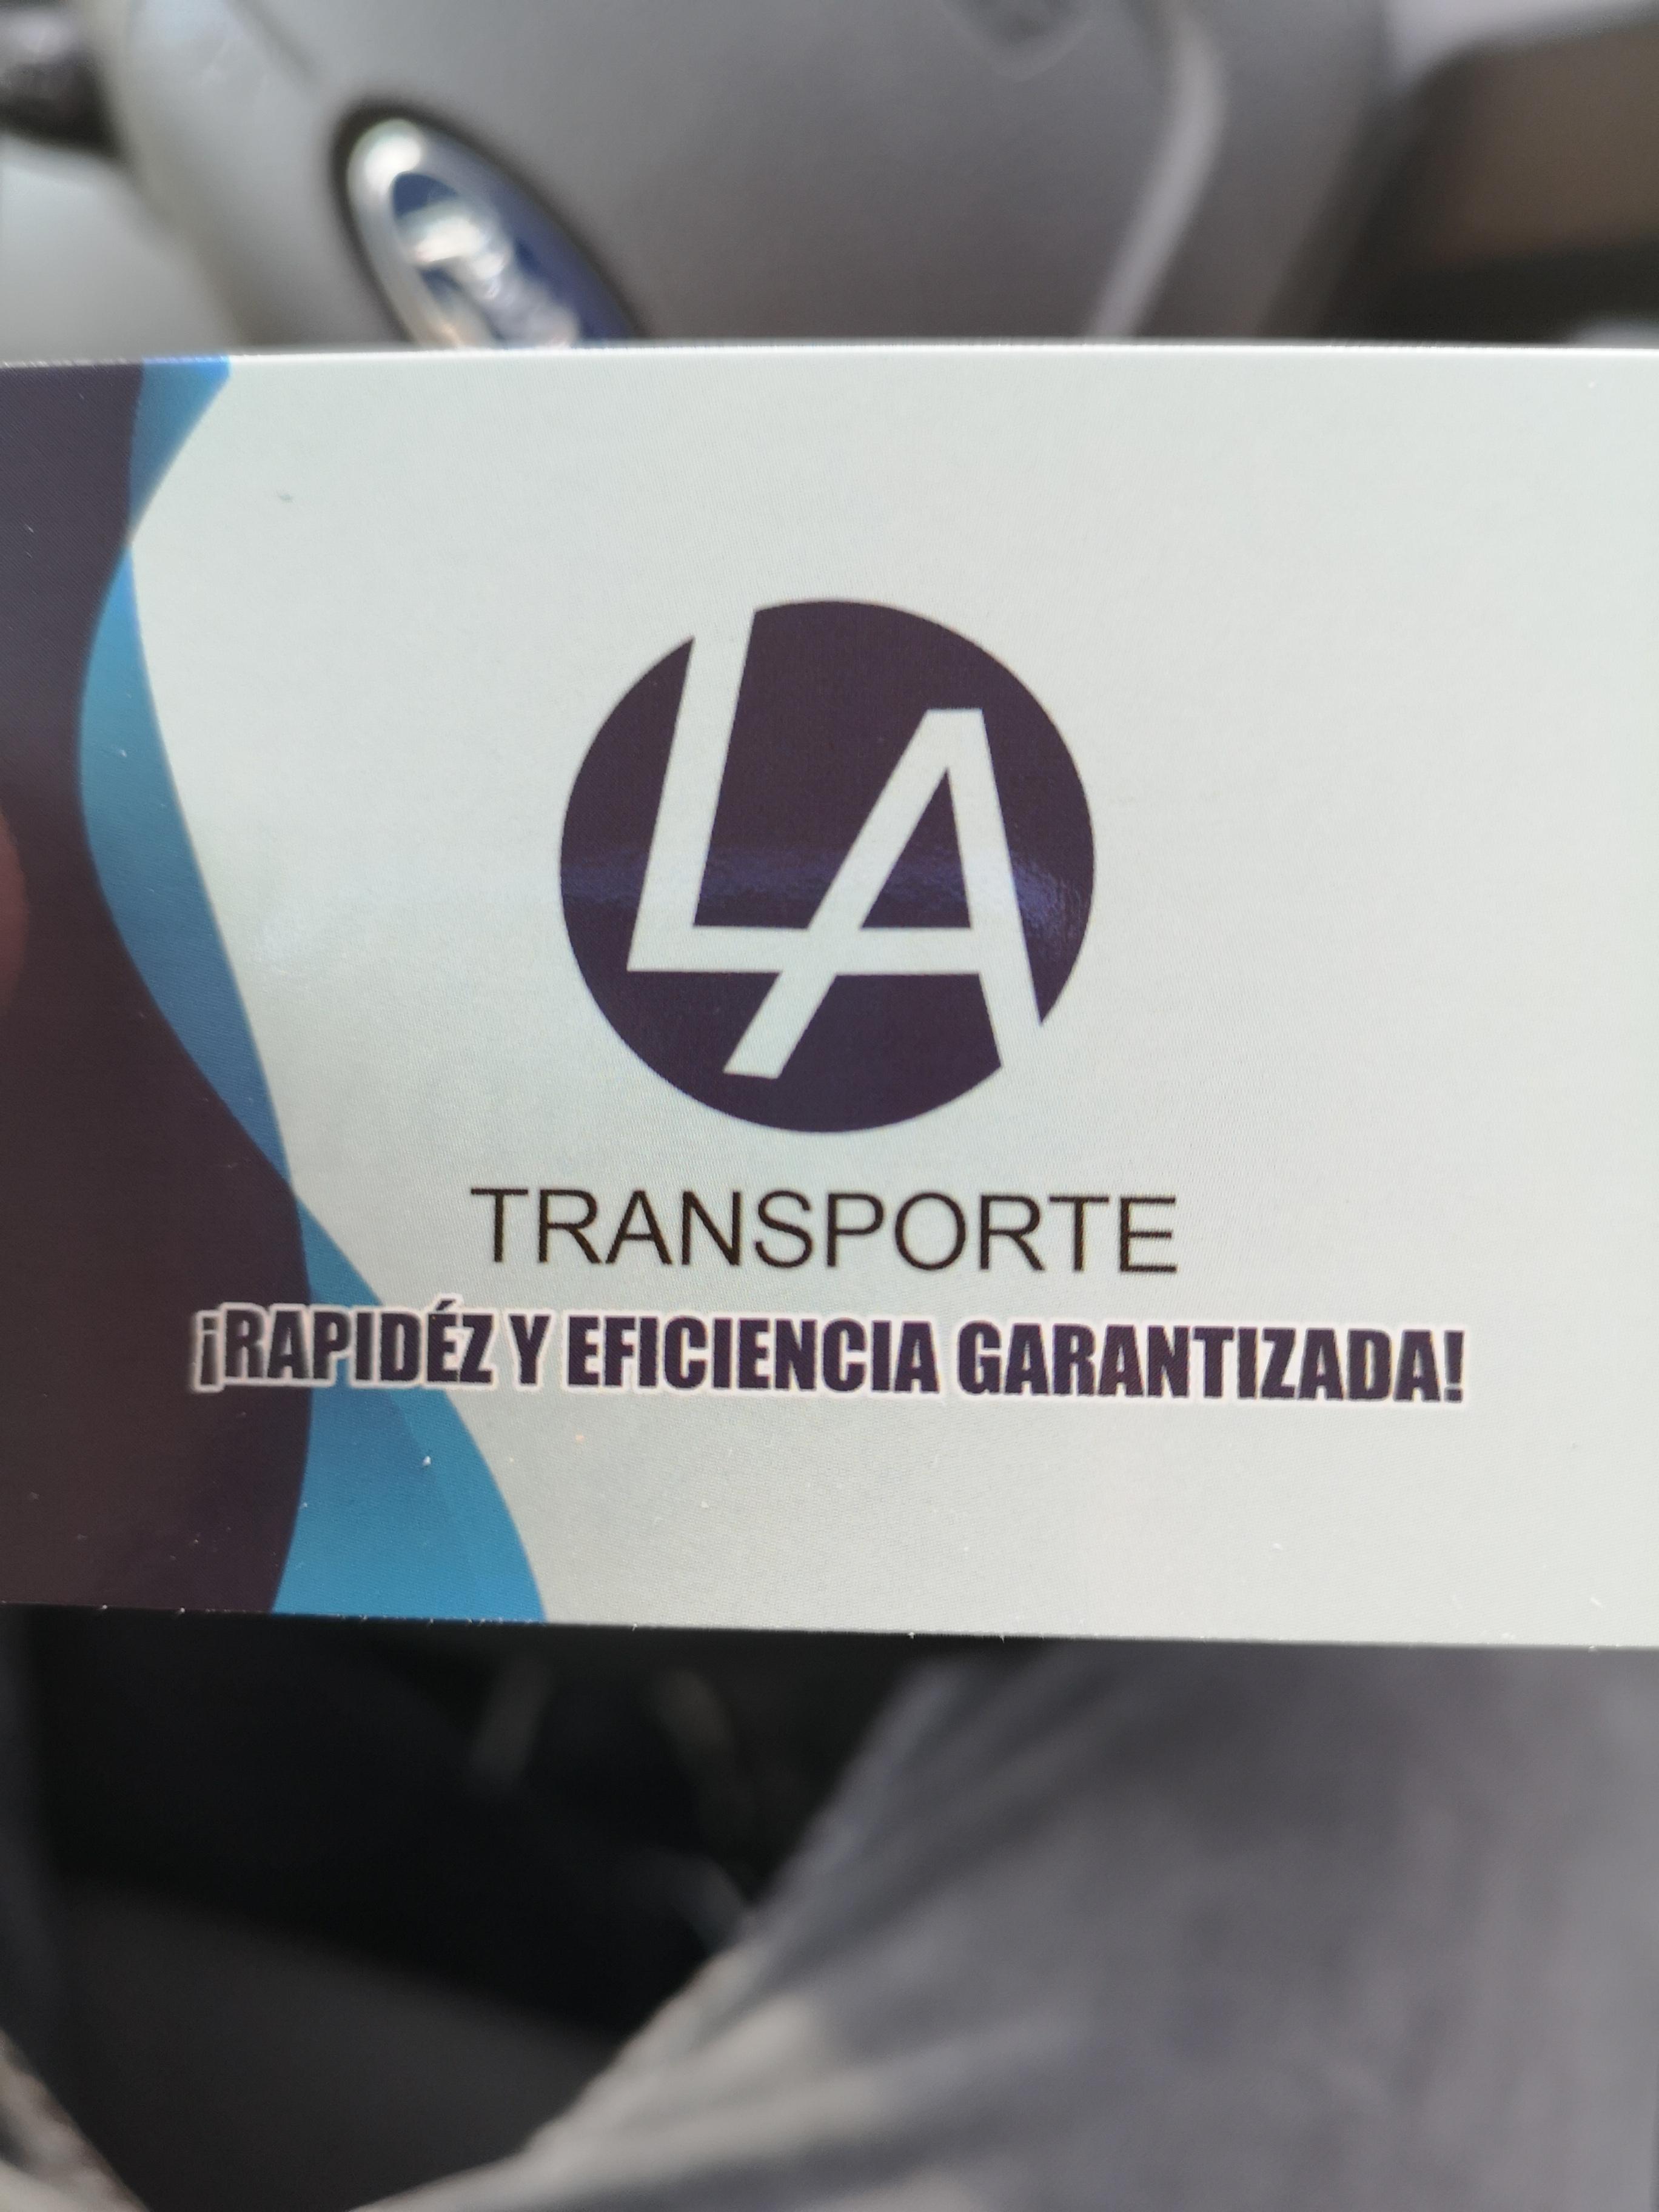 Transporte L&a